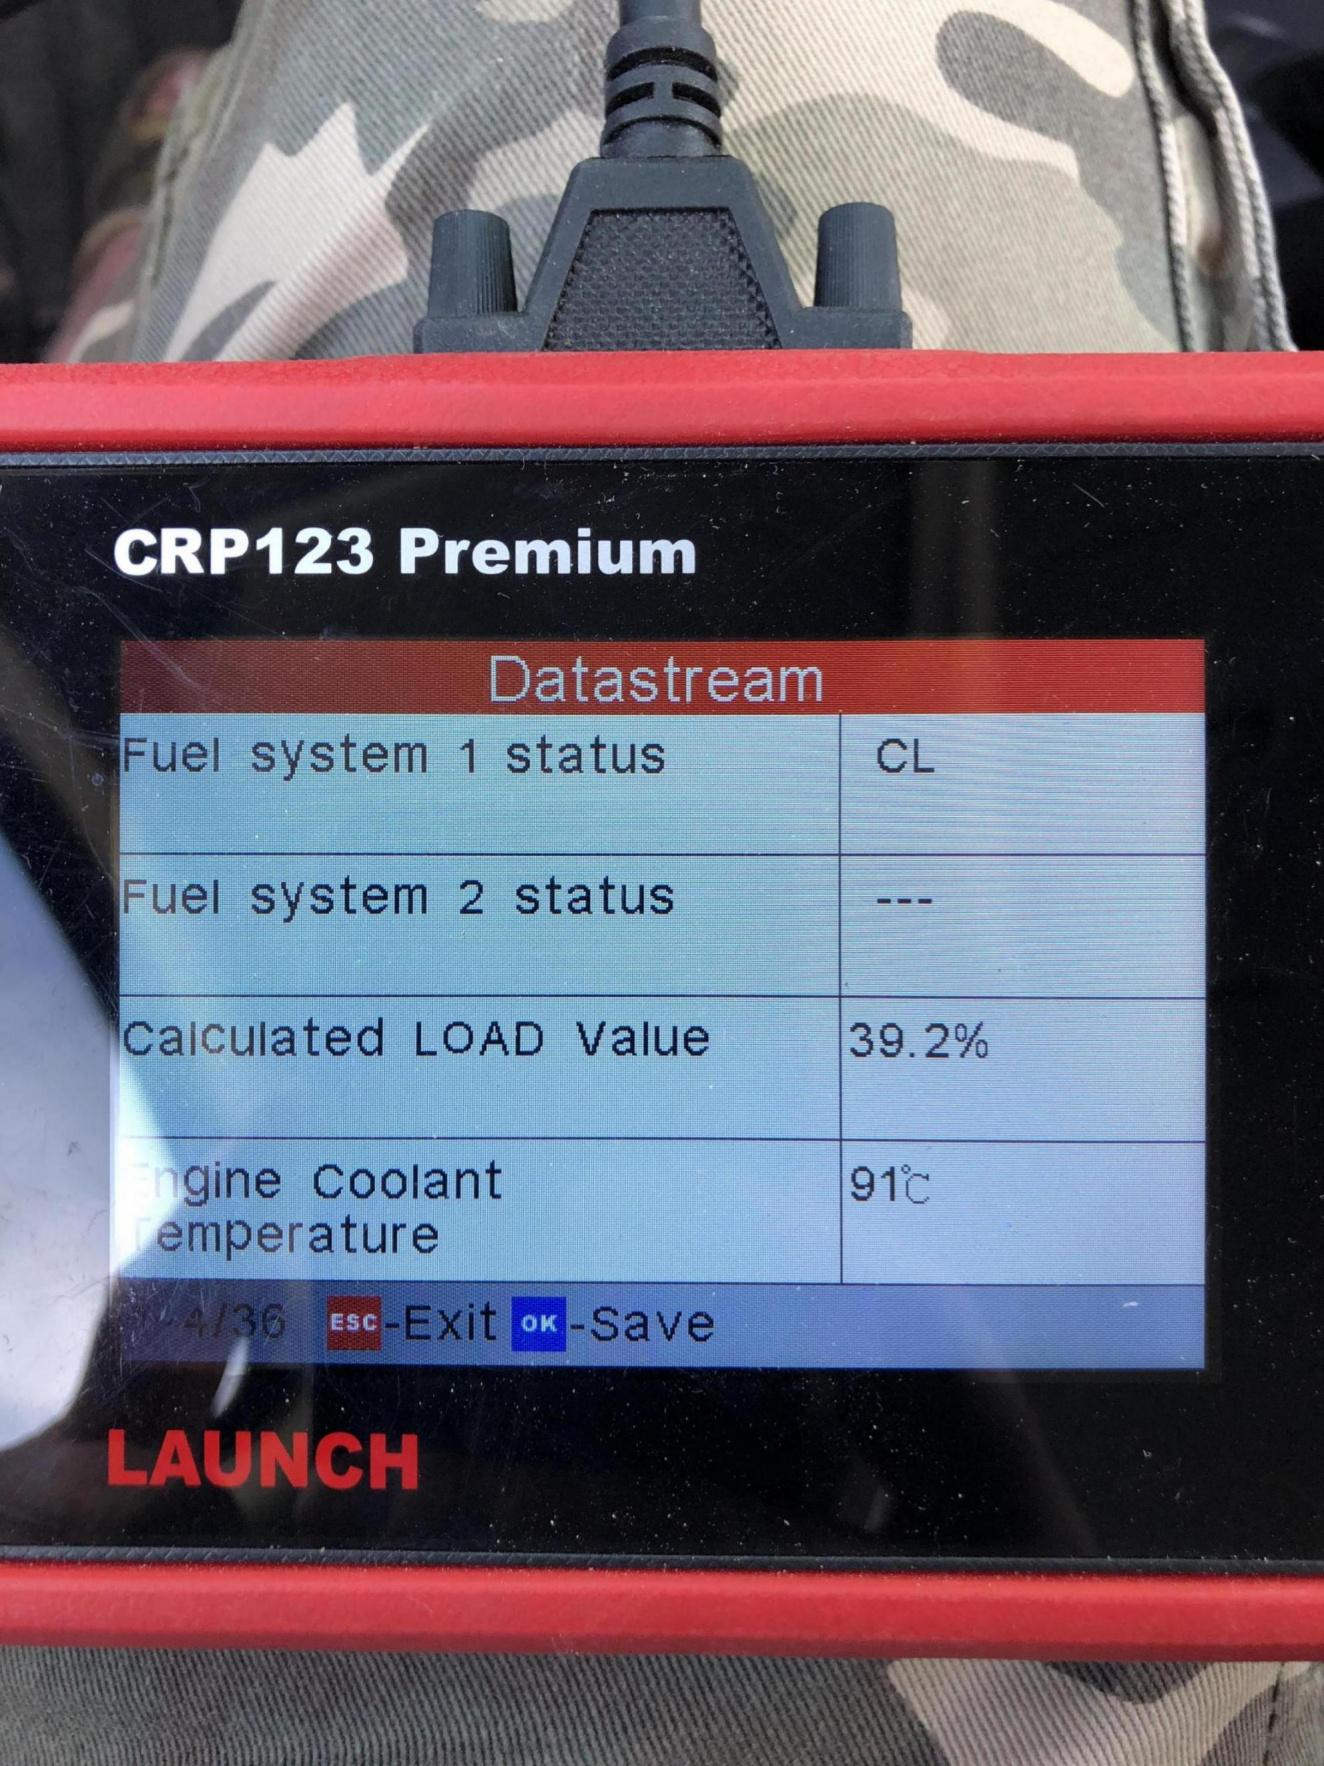 Code P0171 System too Lean. (not the PCV hose)-b9c75d0b-0c40-4682-8d87-8a764436694f_1561676263863.jpg